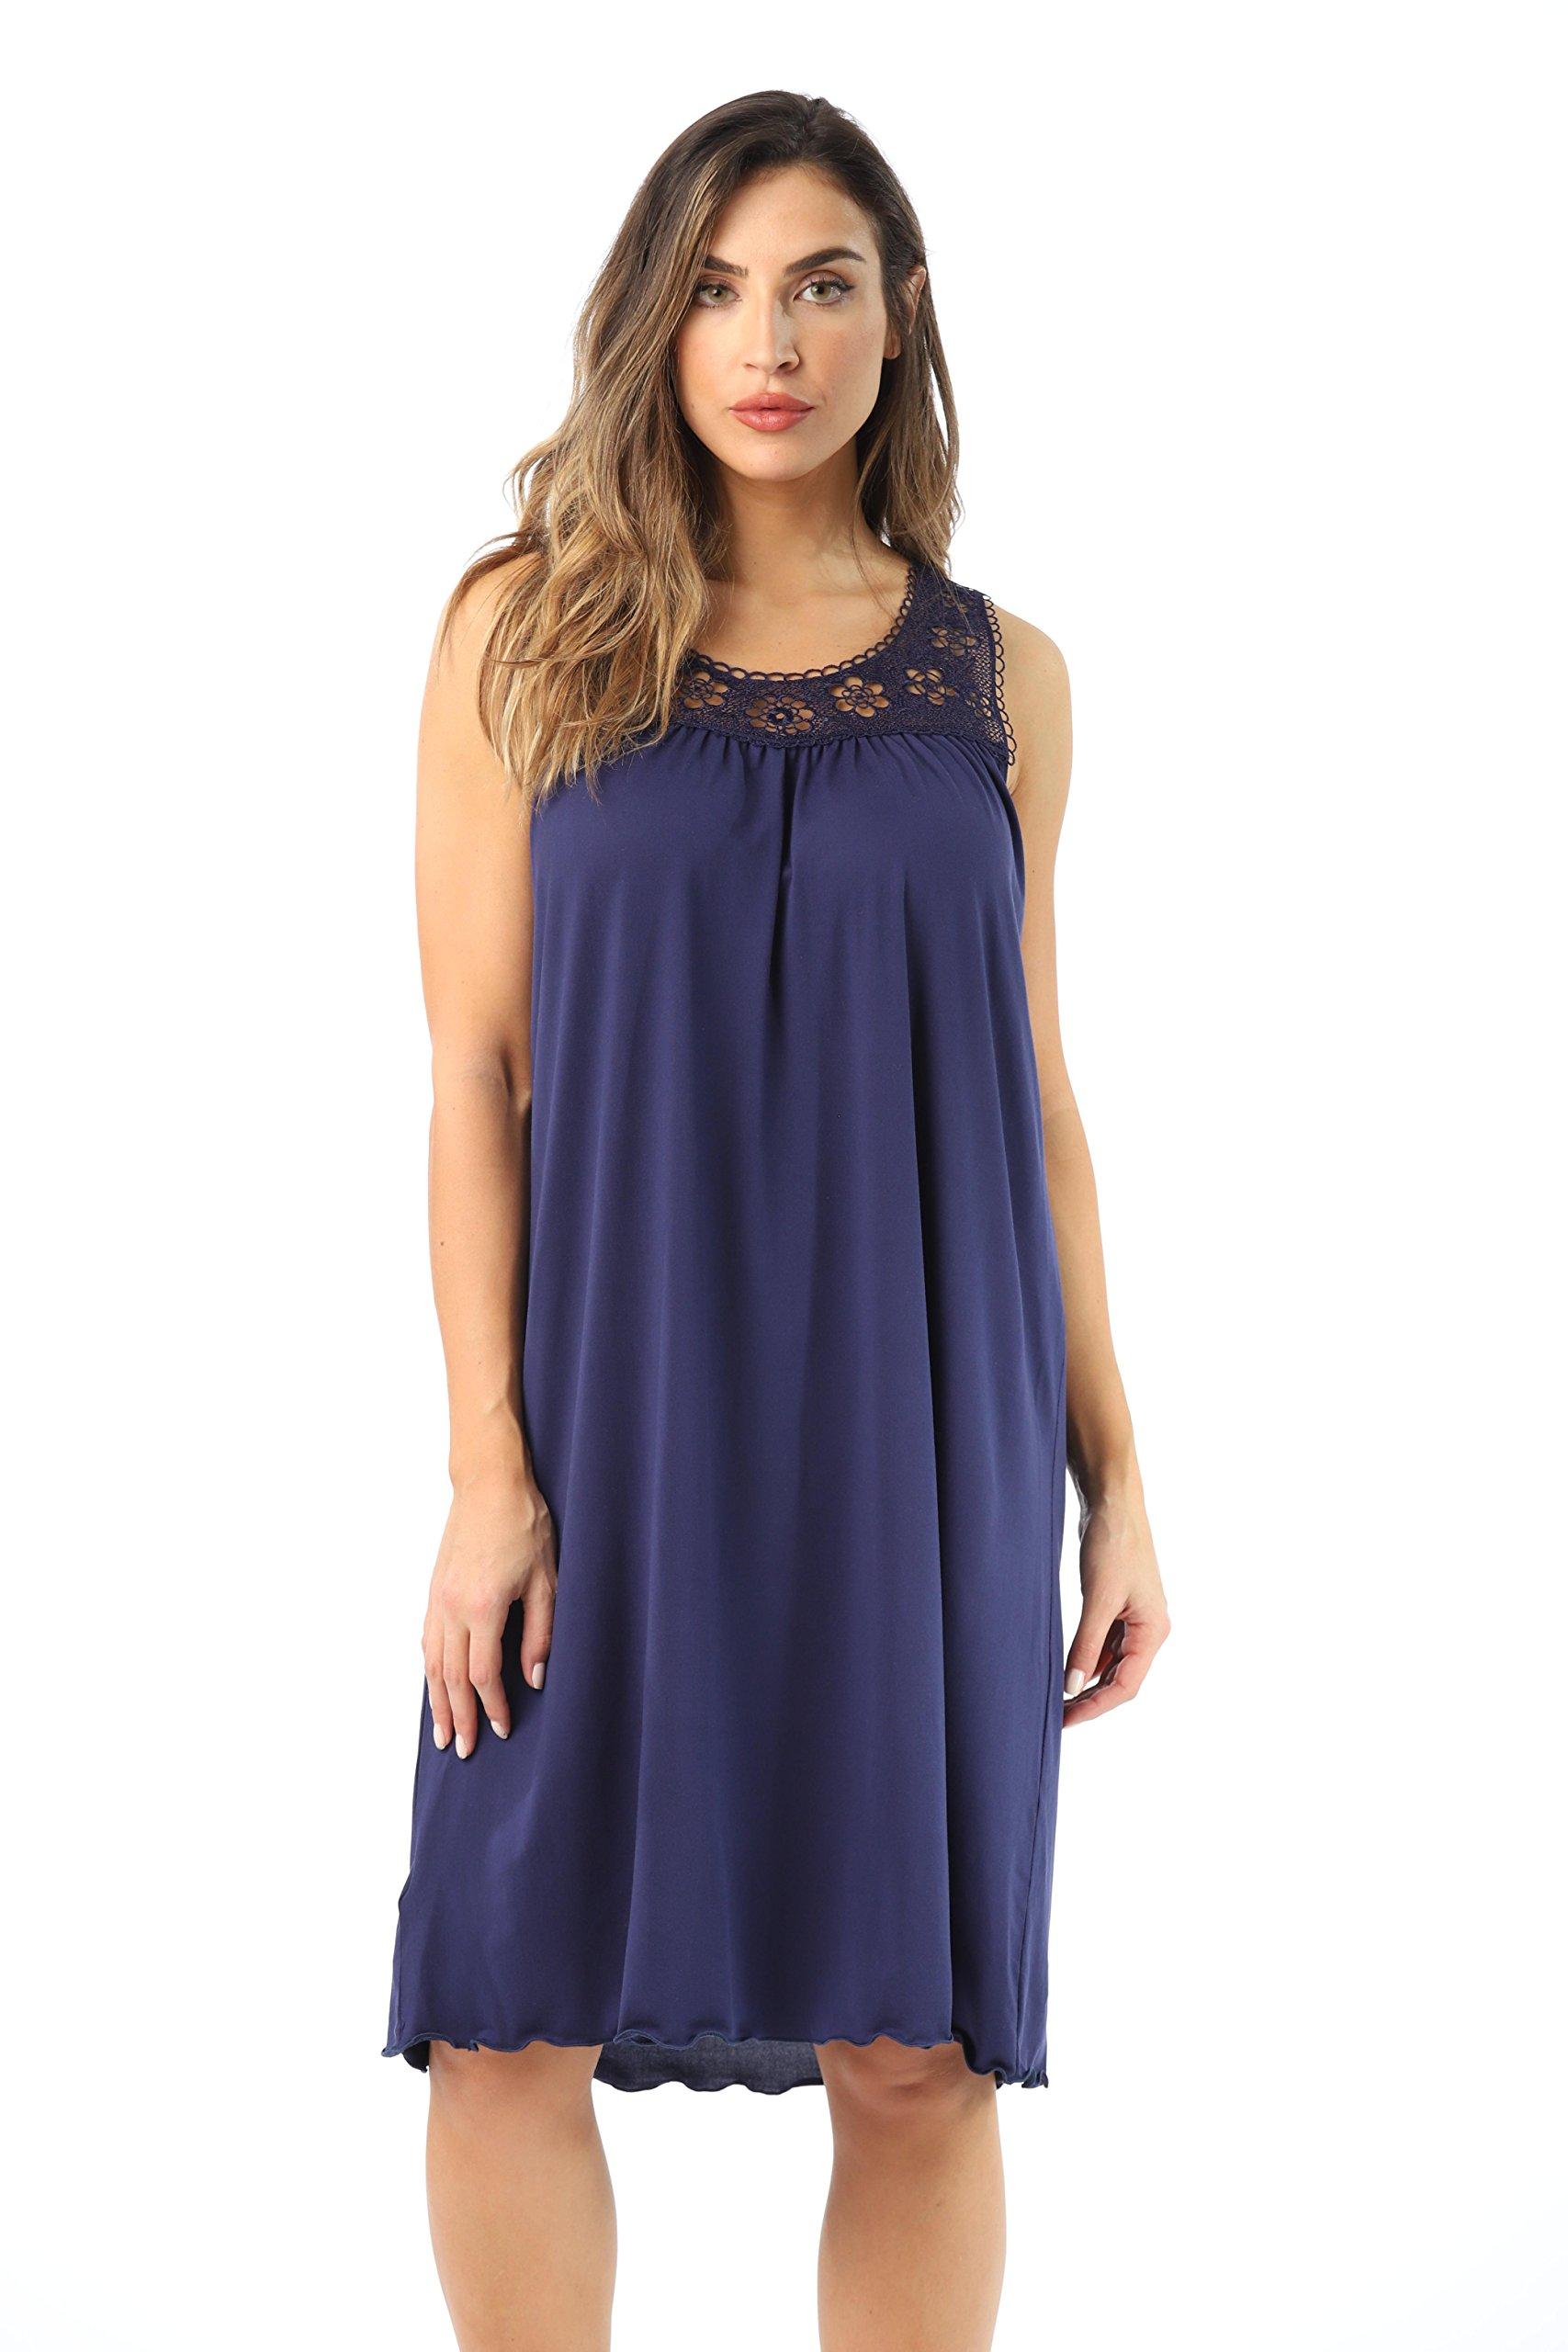 Just Love 1541B-Navy-2X Nightgown/Women Sleepwear/Sleep Dress